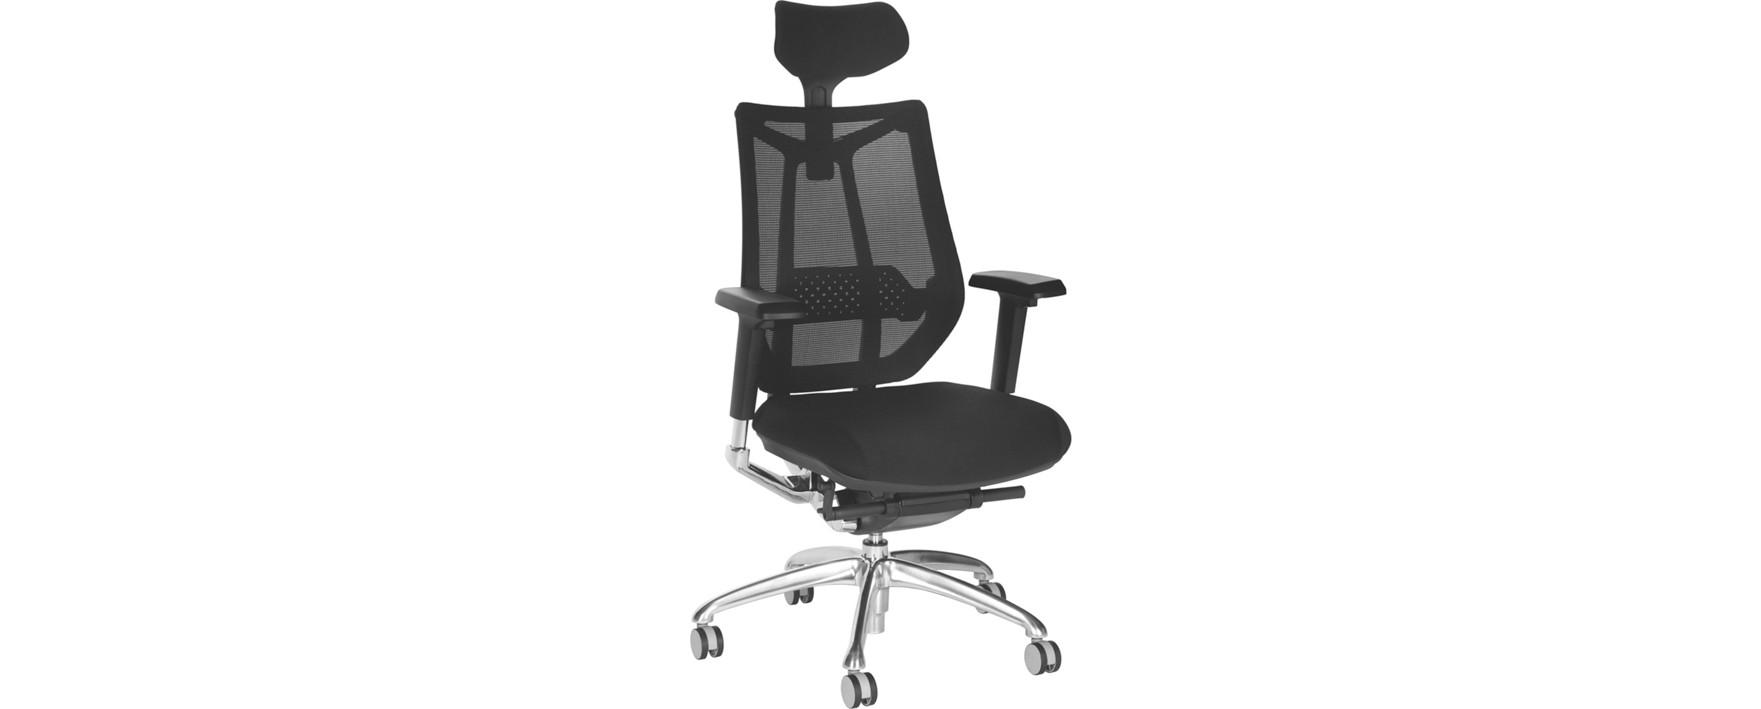 LESNINA XXXL Atraktivno dizajnirane i udobne uredske stolice